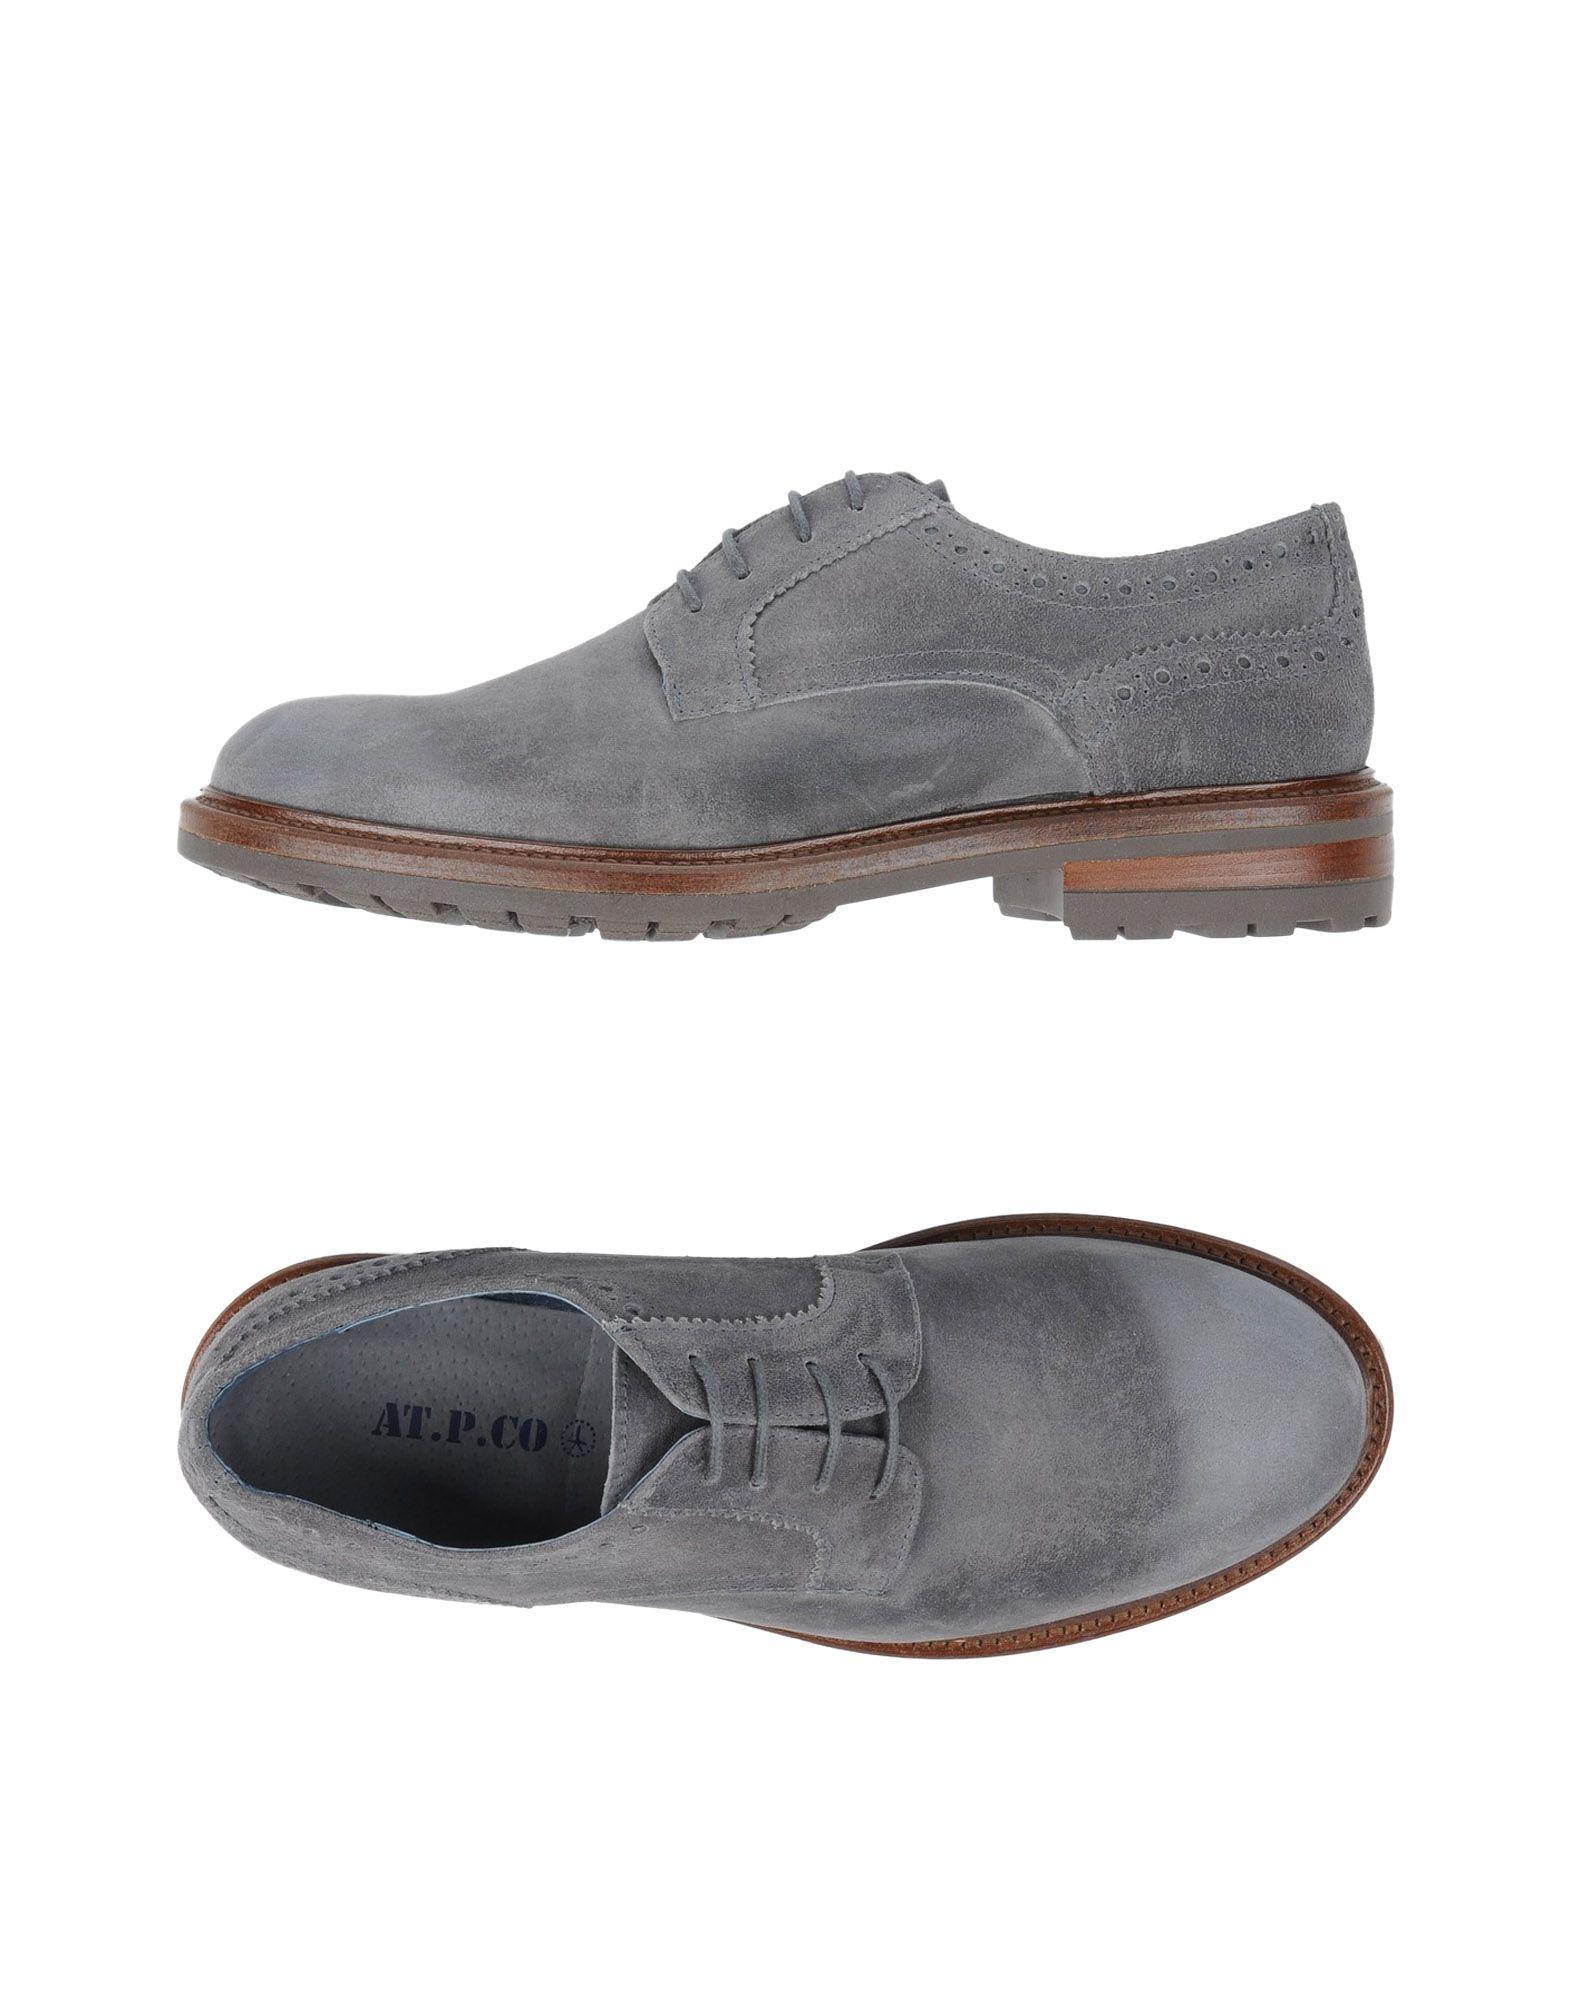 Rabatt echte Schuhe At.P.Co Schnürschuhe Herren  11251874WK